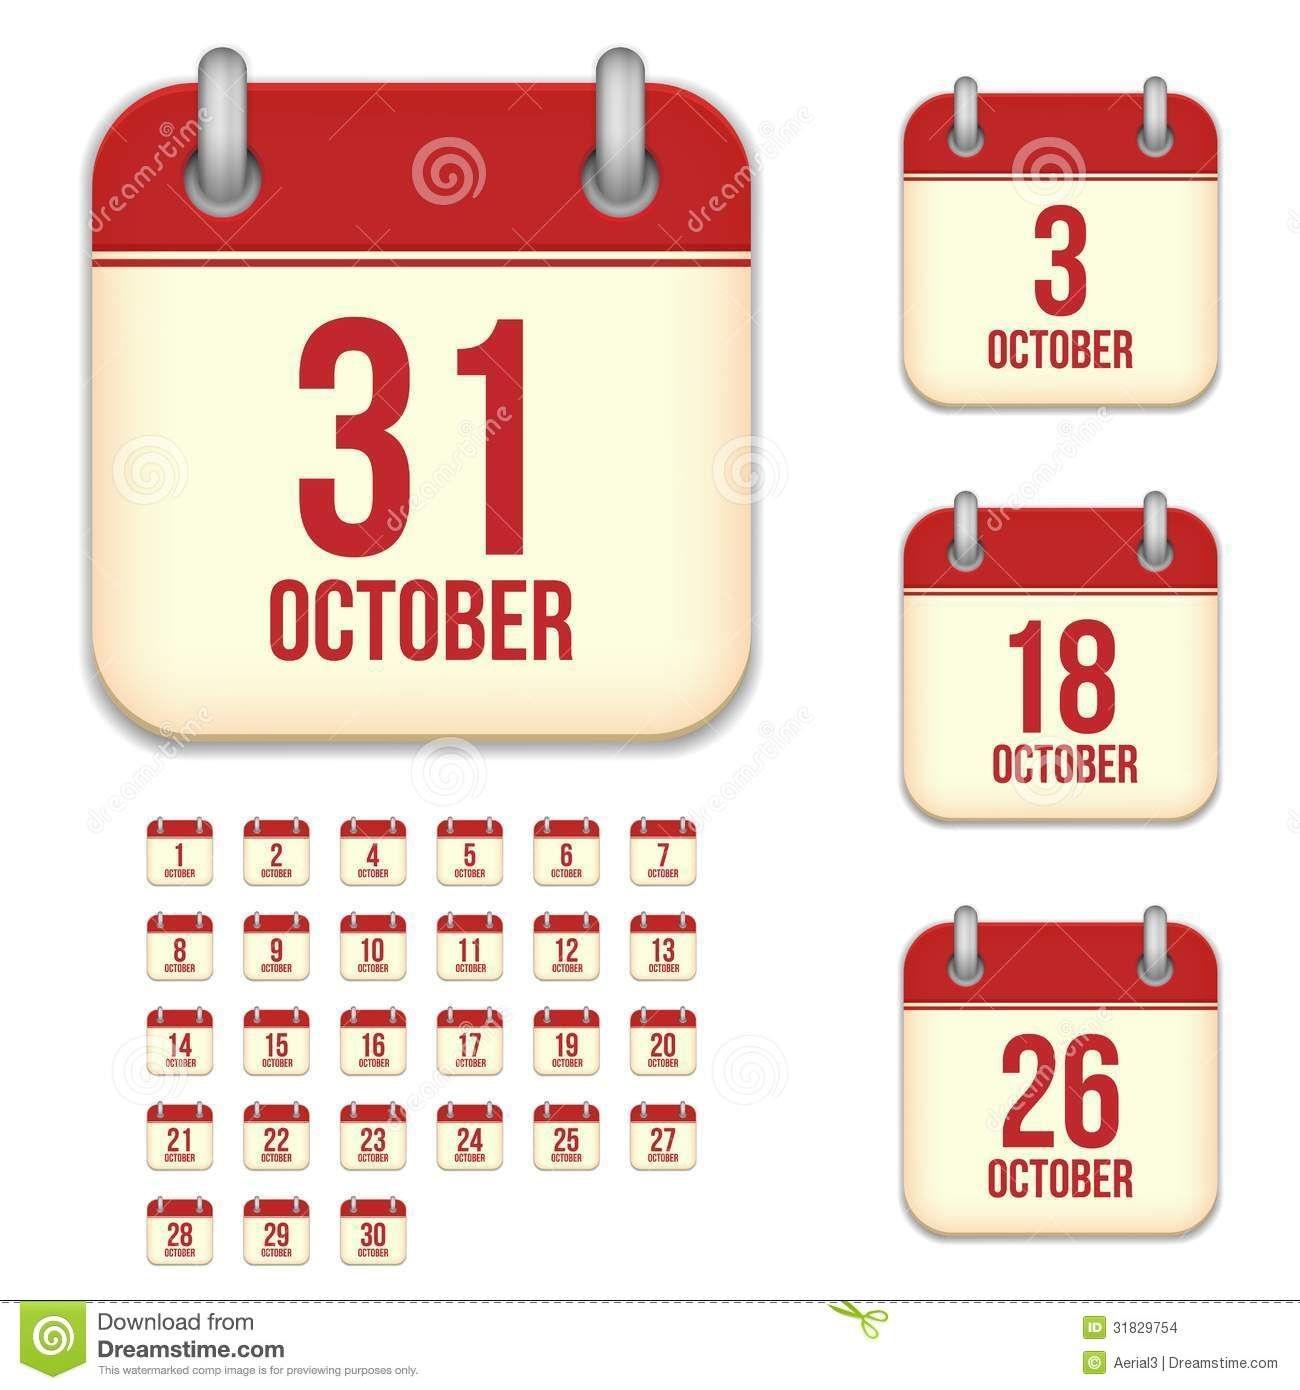 calendar date icon generator | calendar for planning